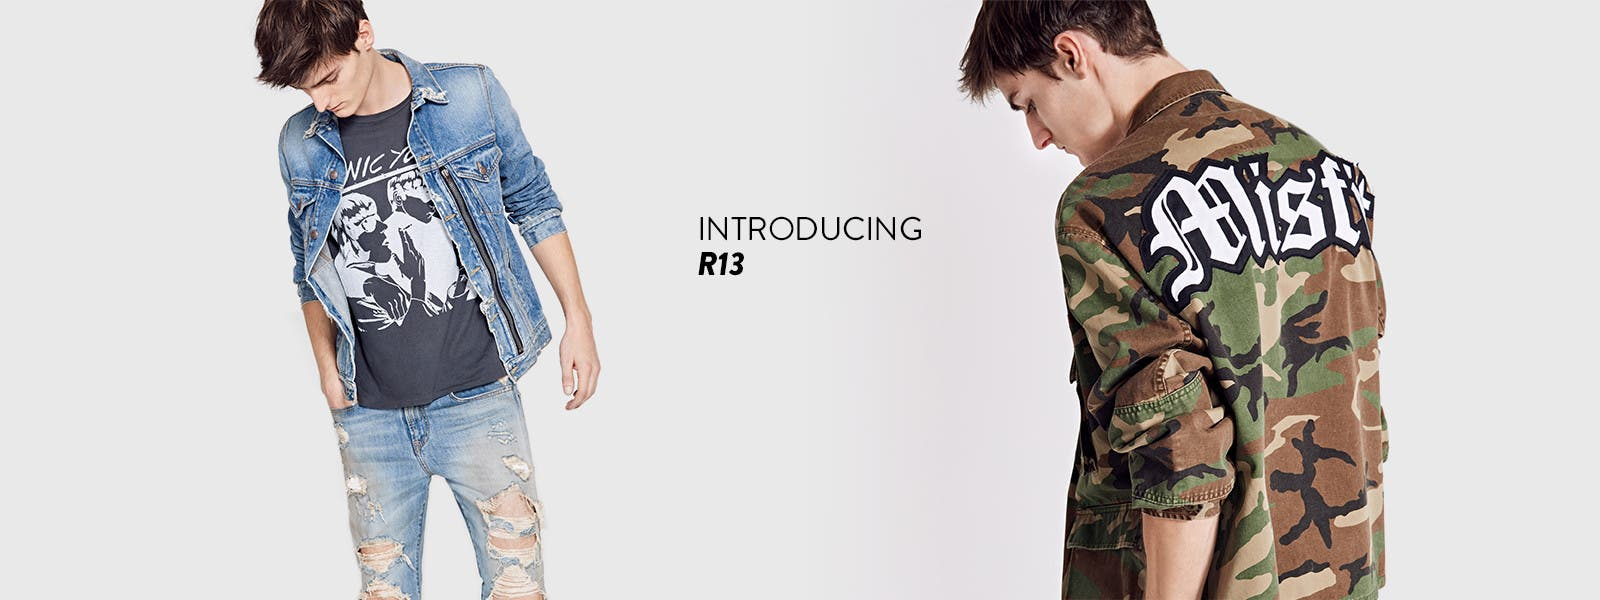 Introducing R13.